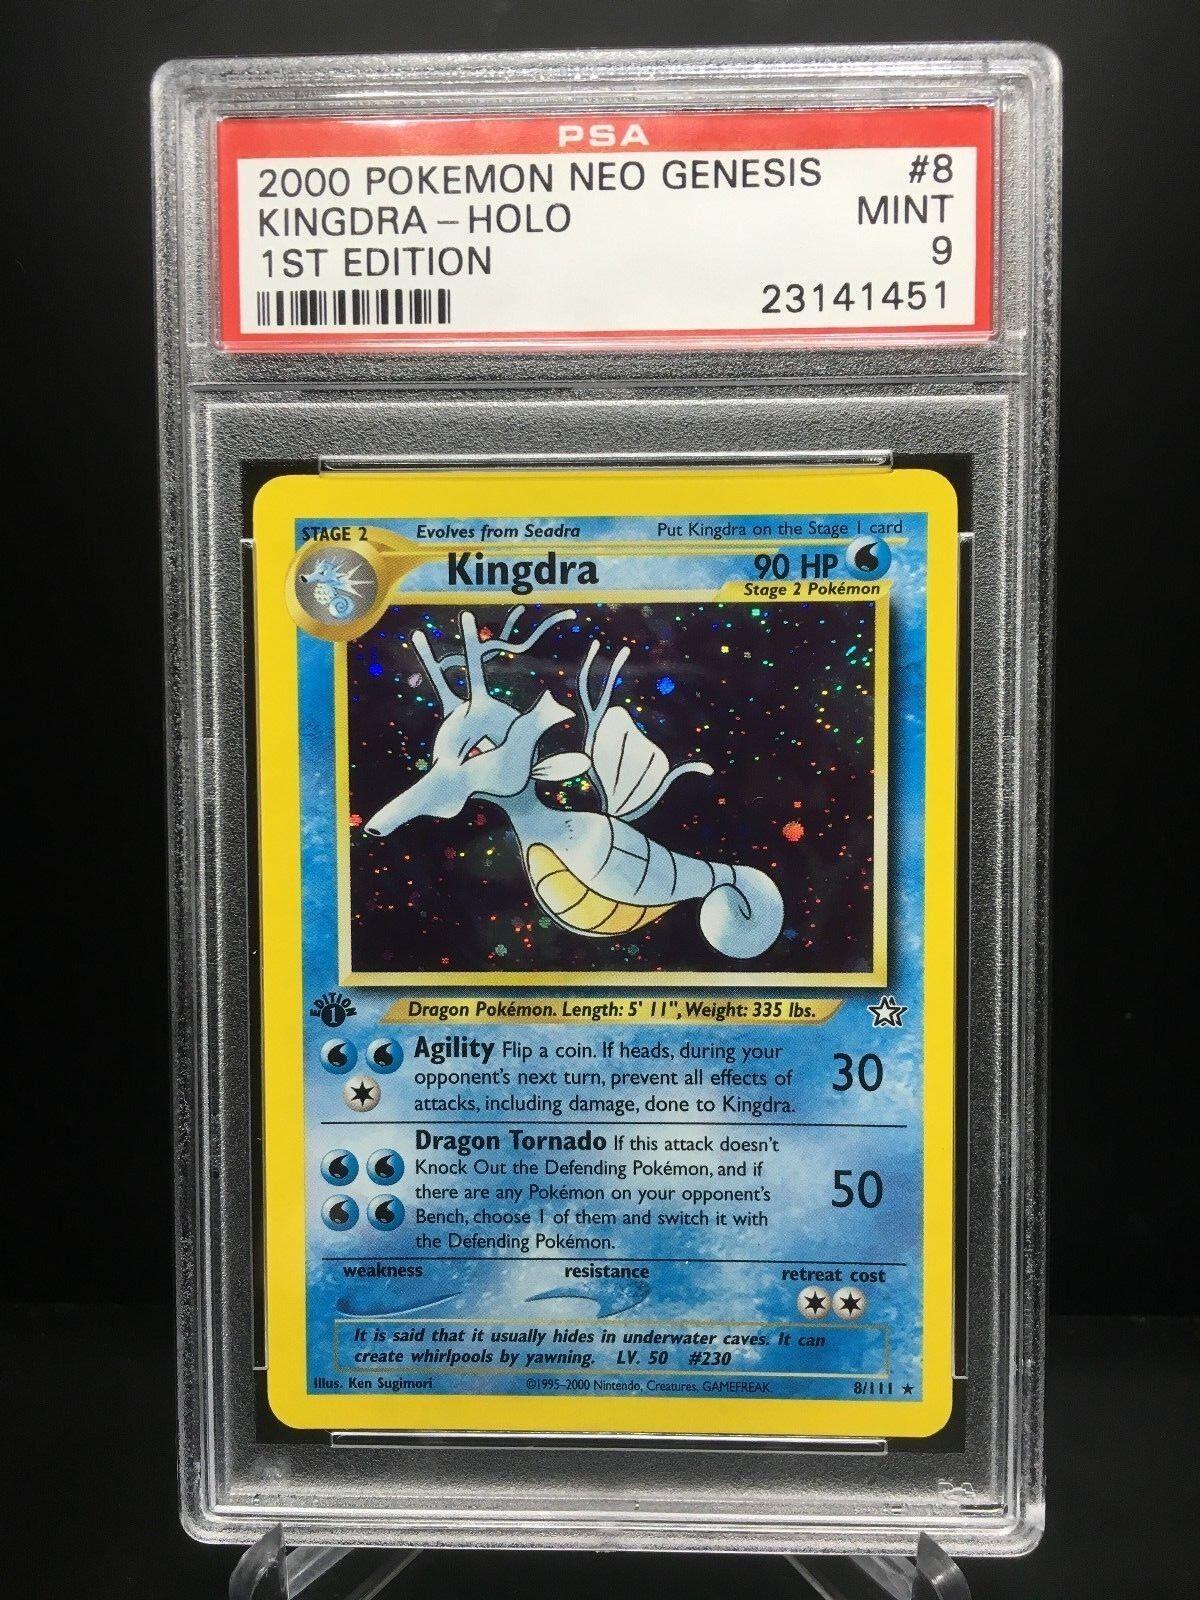 Pokemon - karte  1. ausgabe kingdra holo 2001 neo - genesis hat psa - 9 -